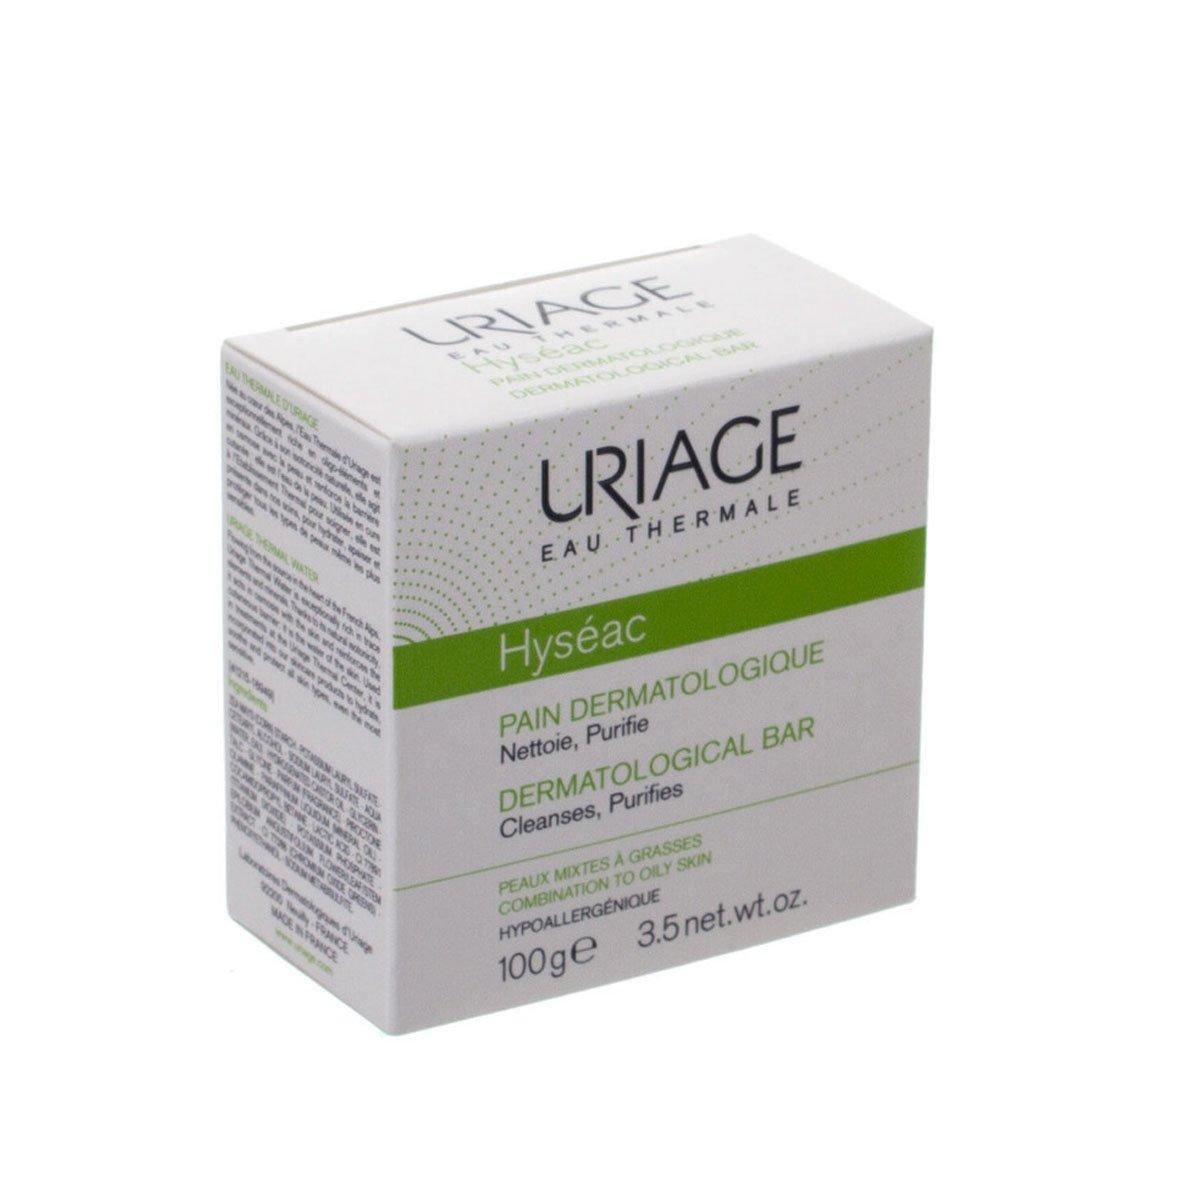 Uriage Hyseac Pain Dermatologico 100g